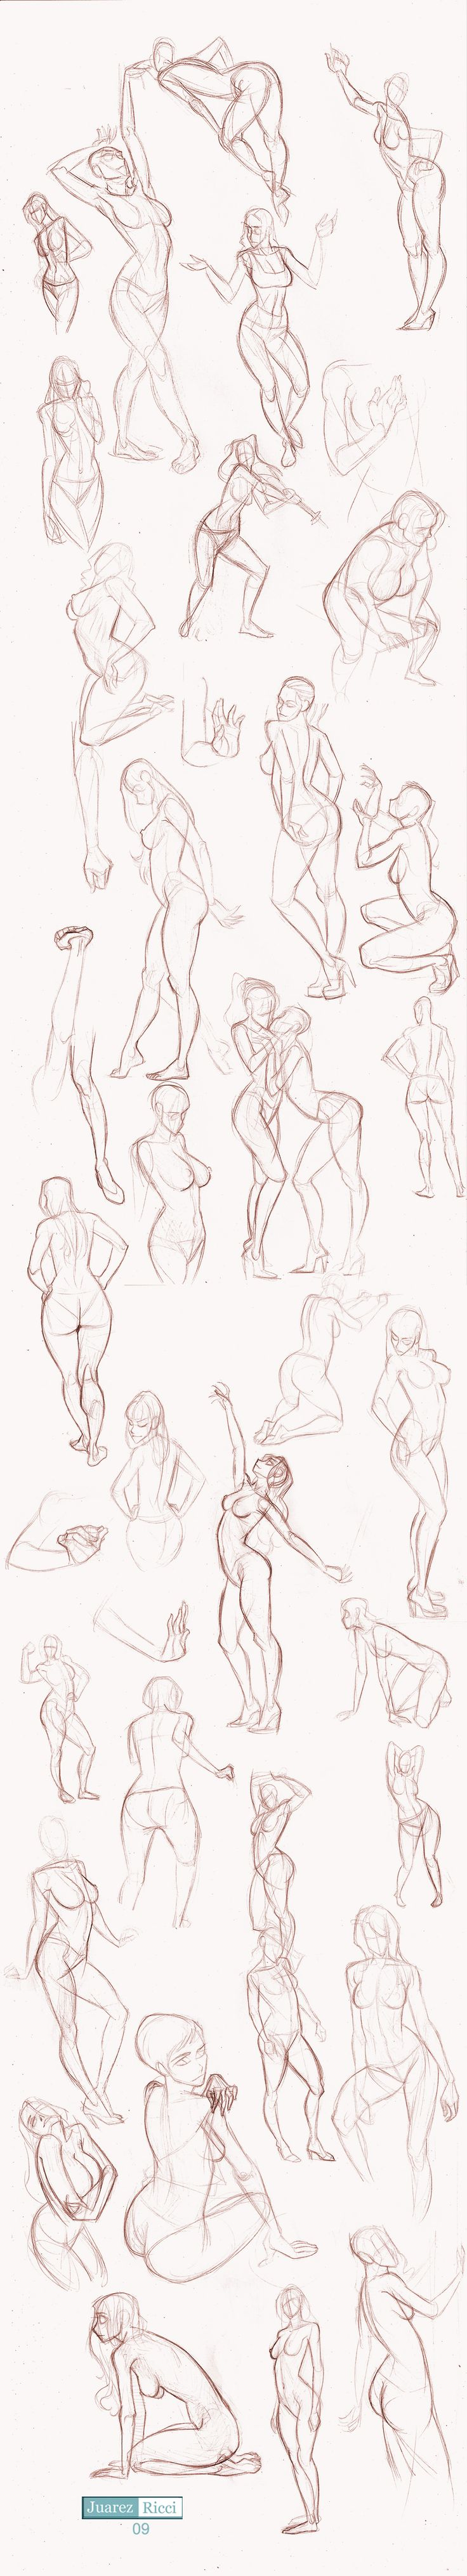 Studies Part II by juarezricci.deviantart.com on @deviantART